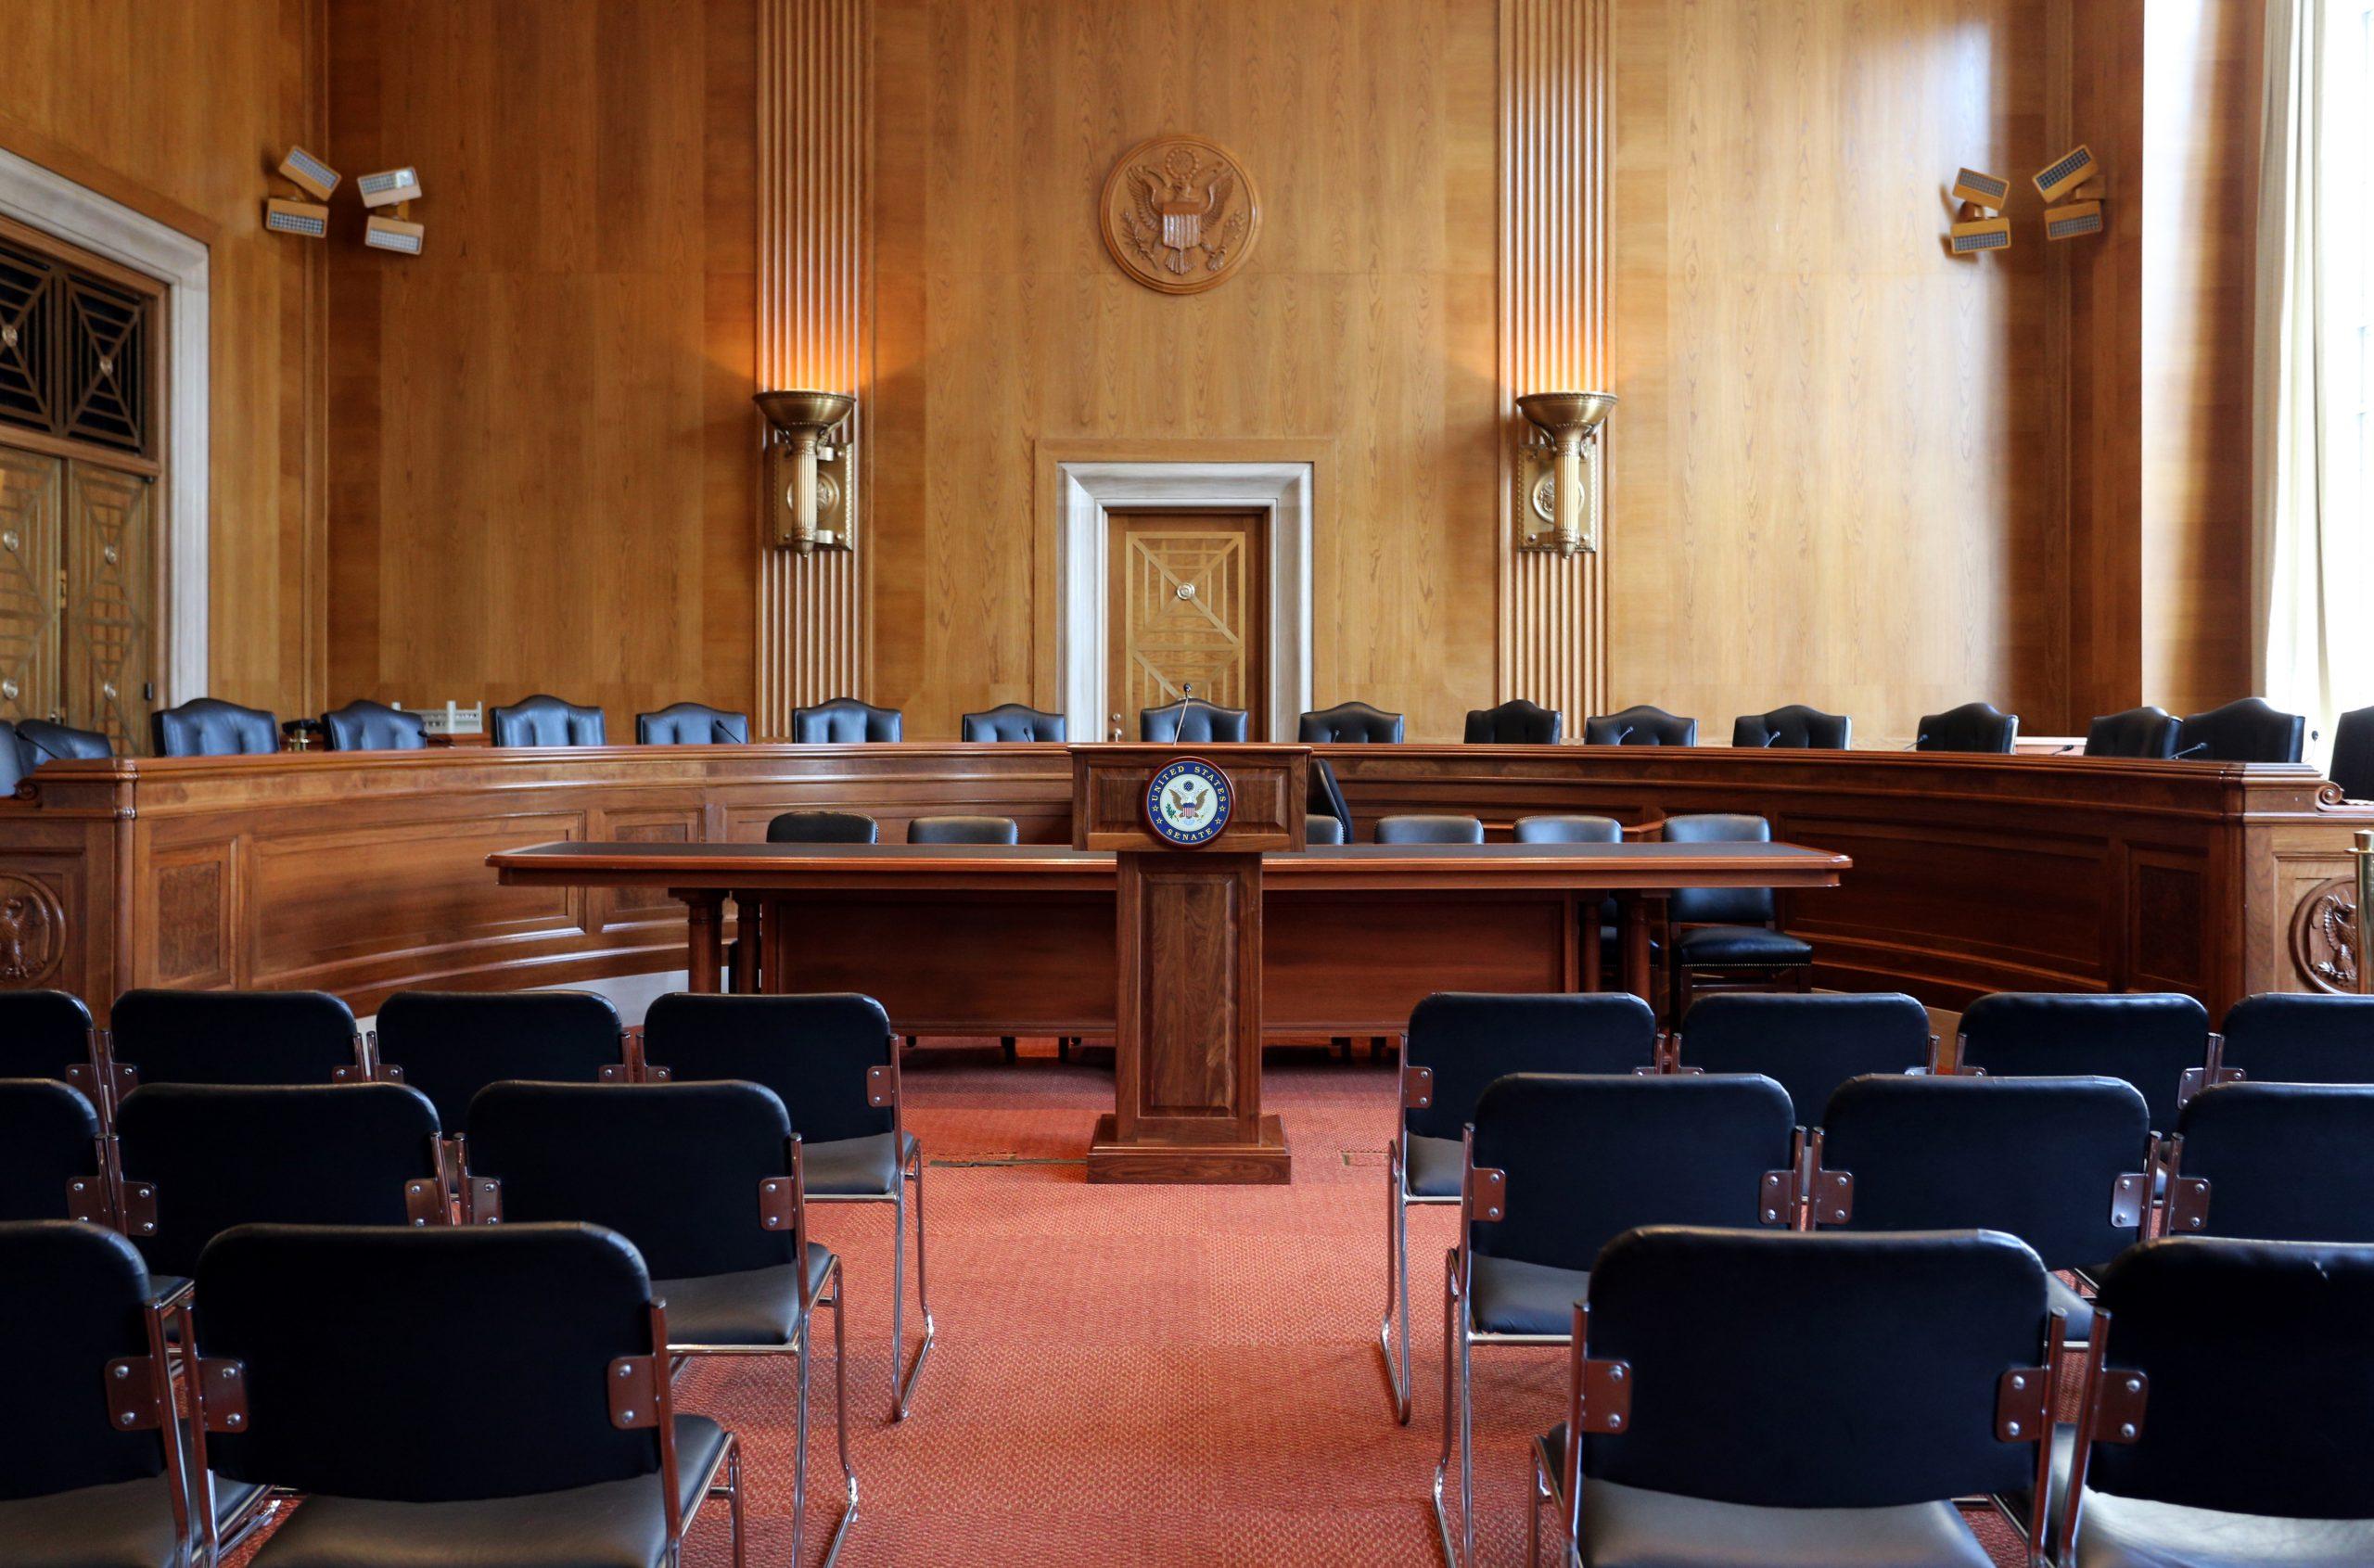 Senate Hearing Room